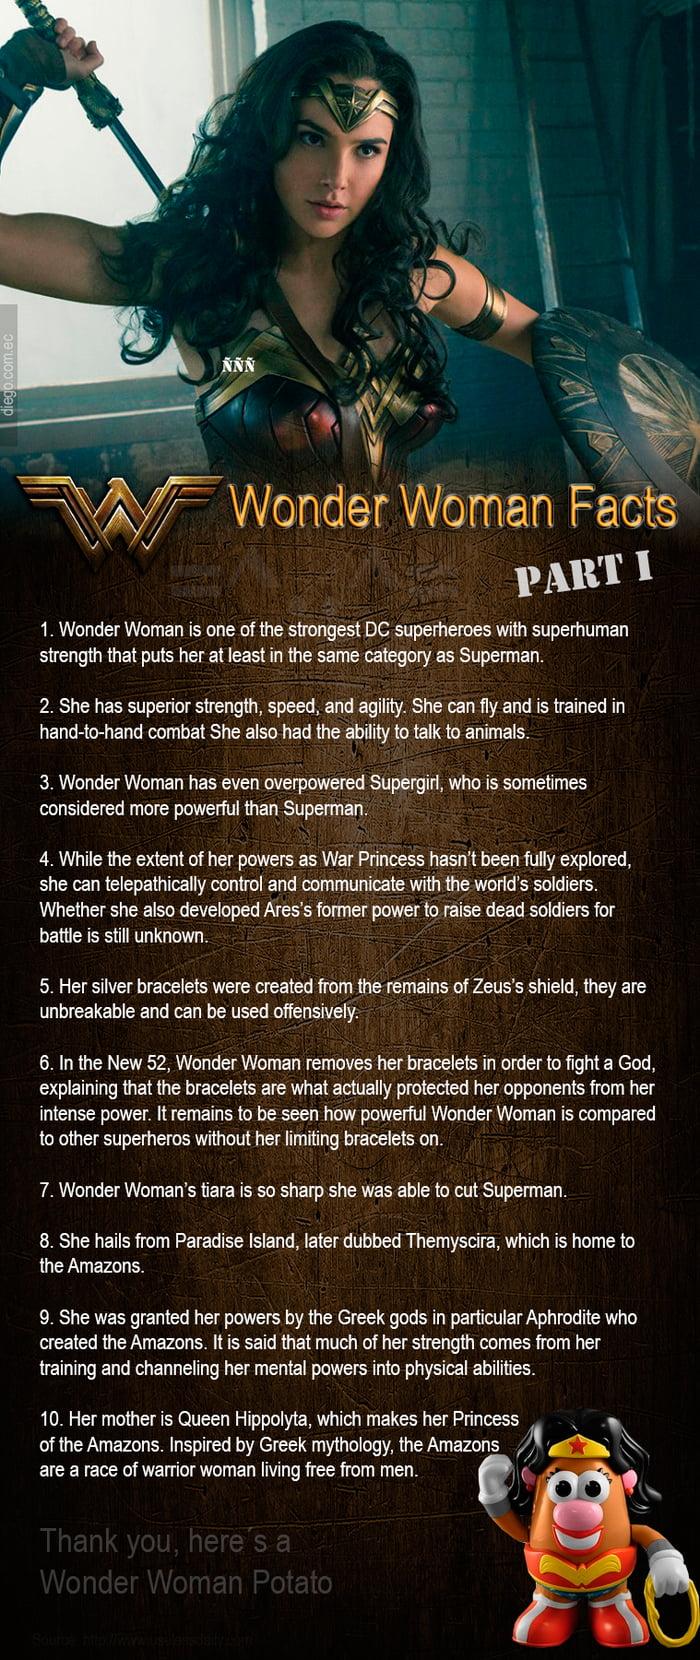 10 wonder woman facts